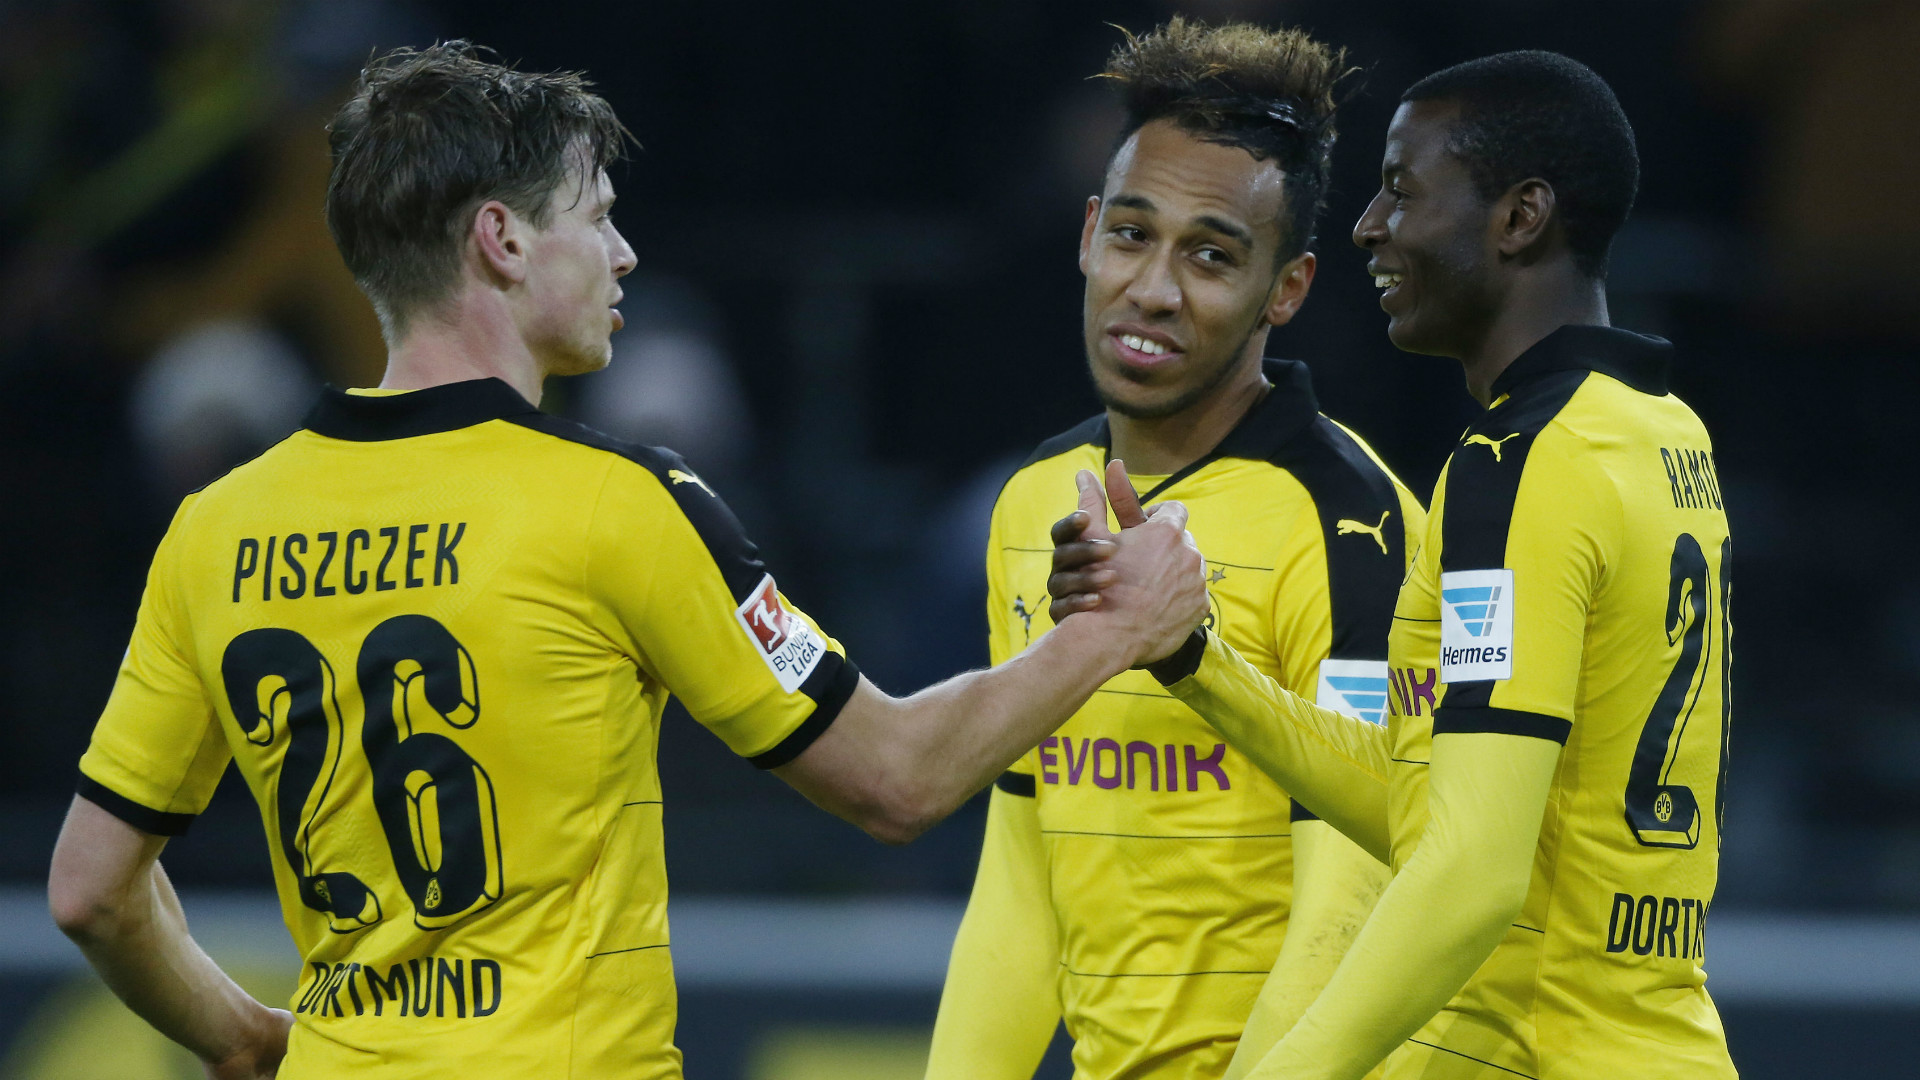 Lukasz Piszczek Adrian Ramos Pierre Emerick Aubameyang Borussia Dortmund